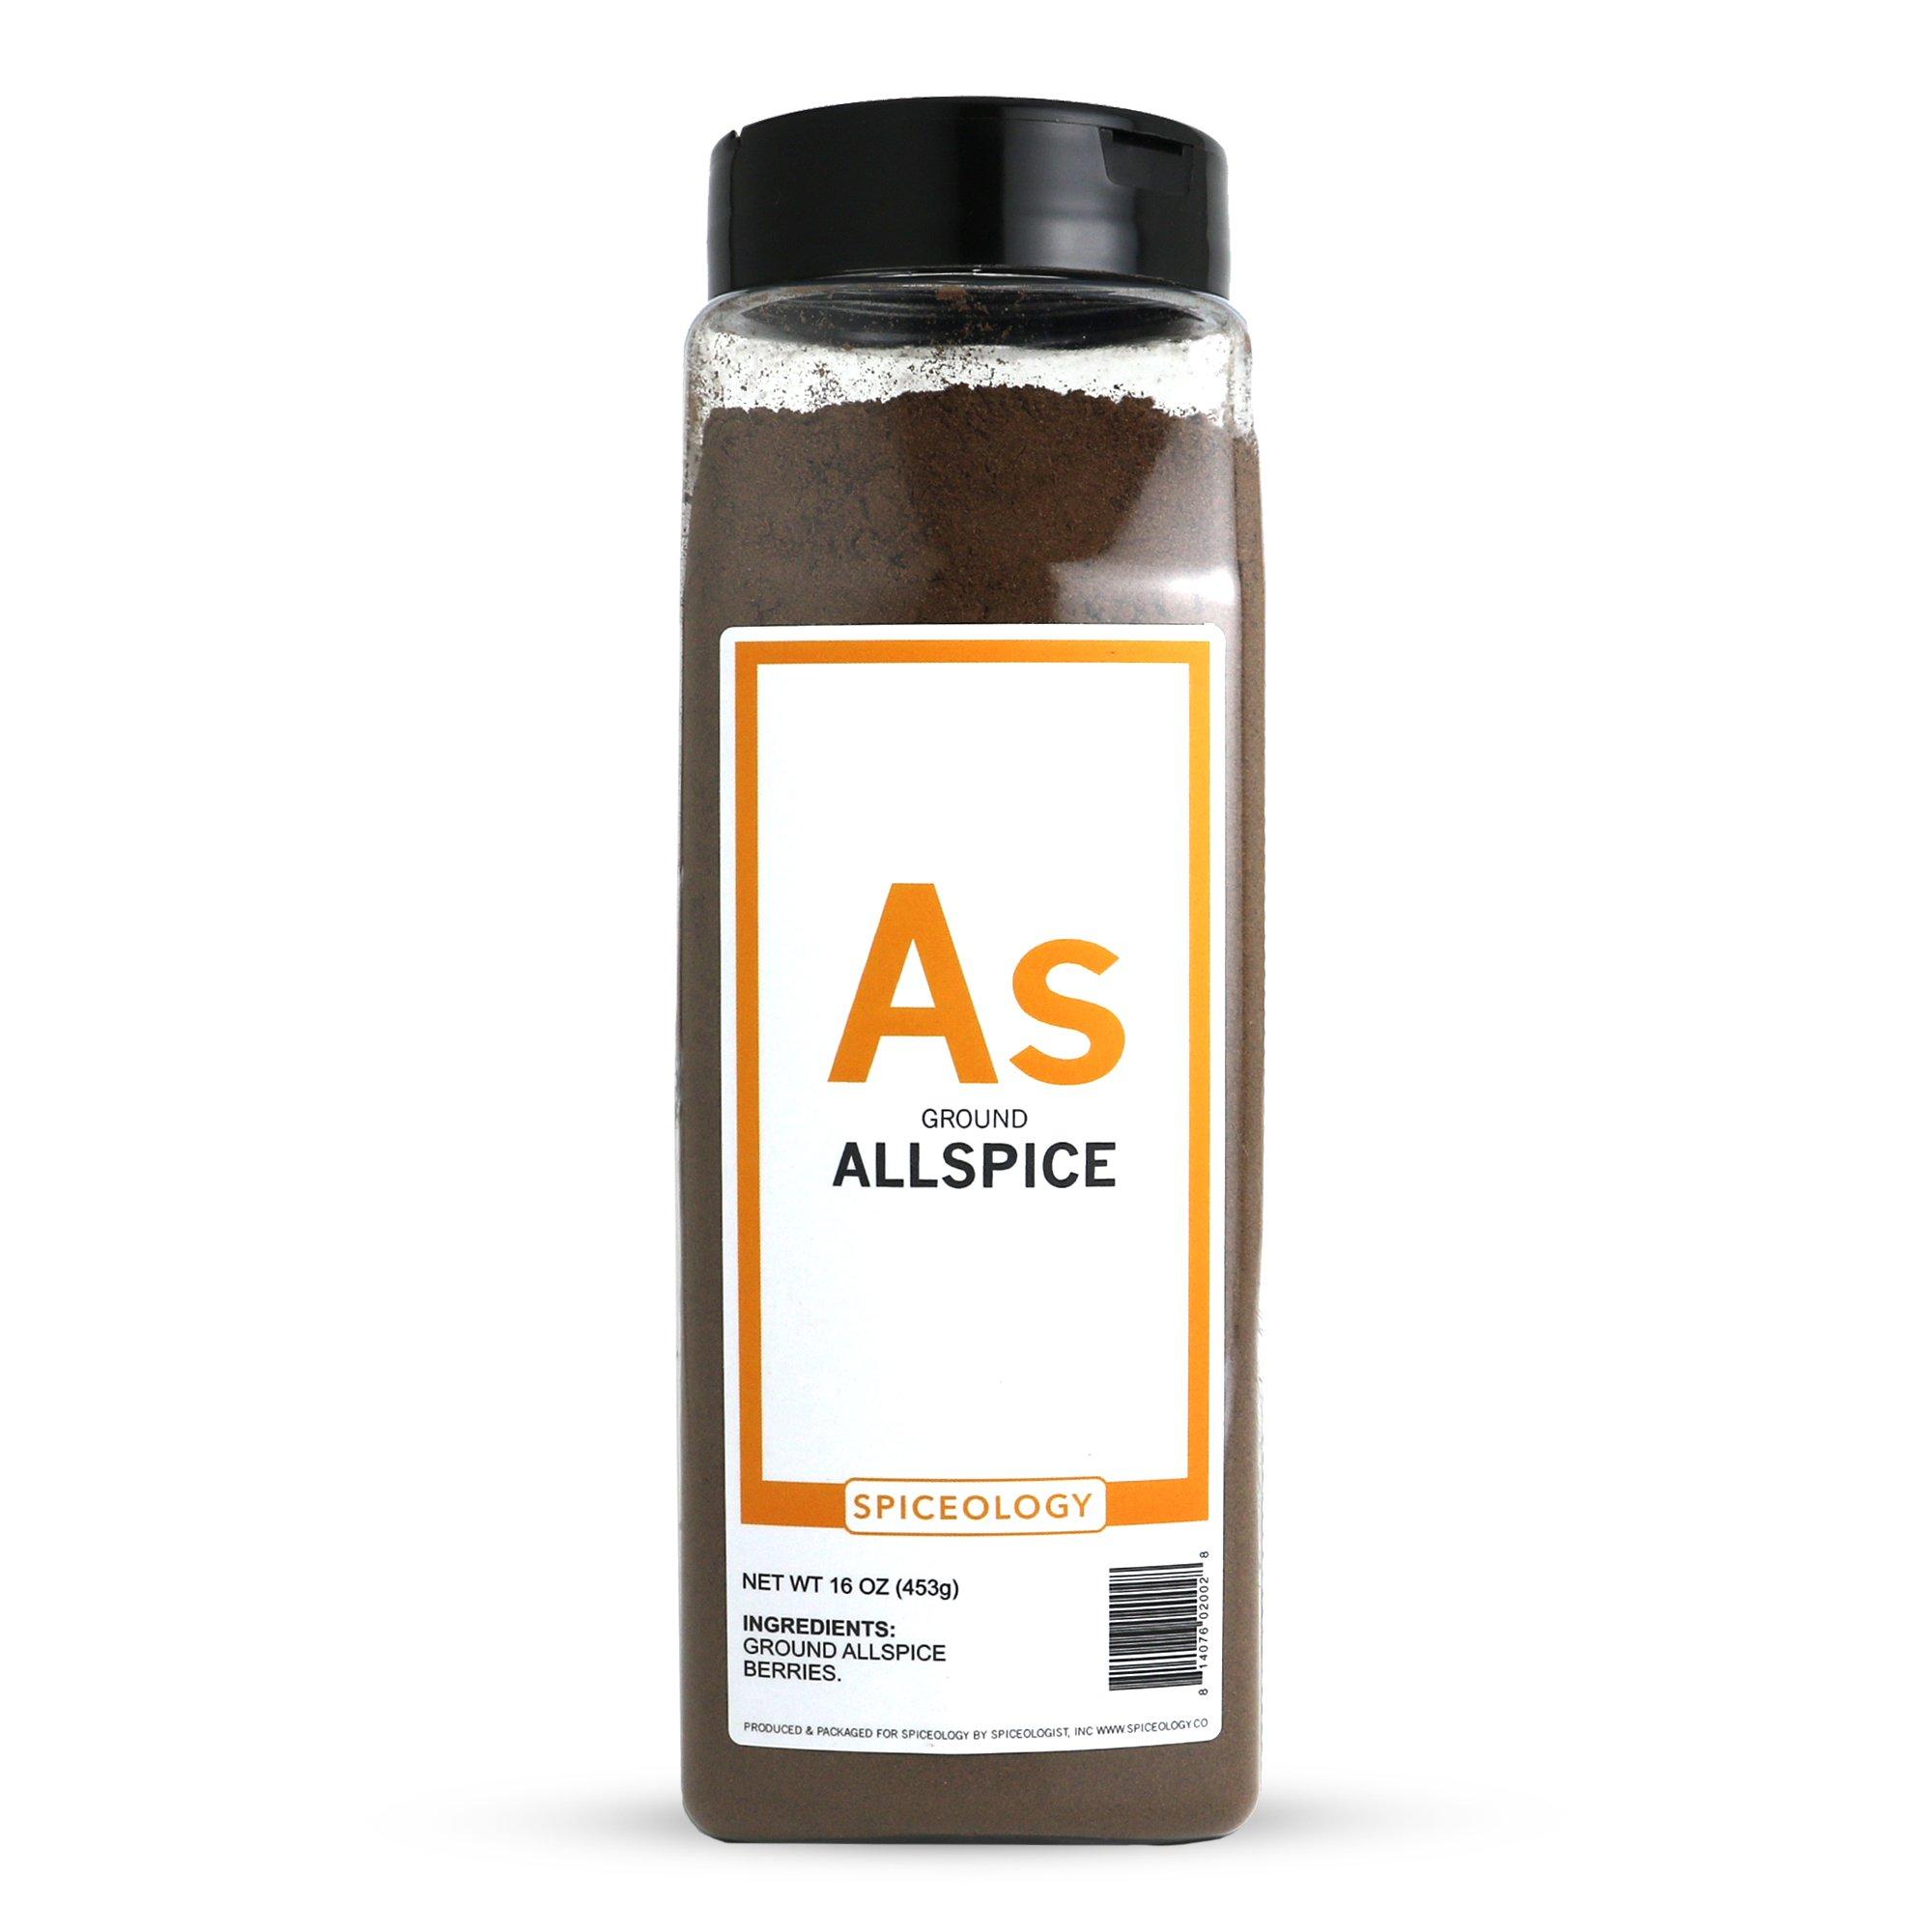 Spiceology Premium Spices - Ground Allspice Powder, 16 oz by Spiceology (Image #1)